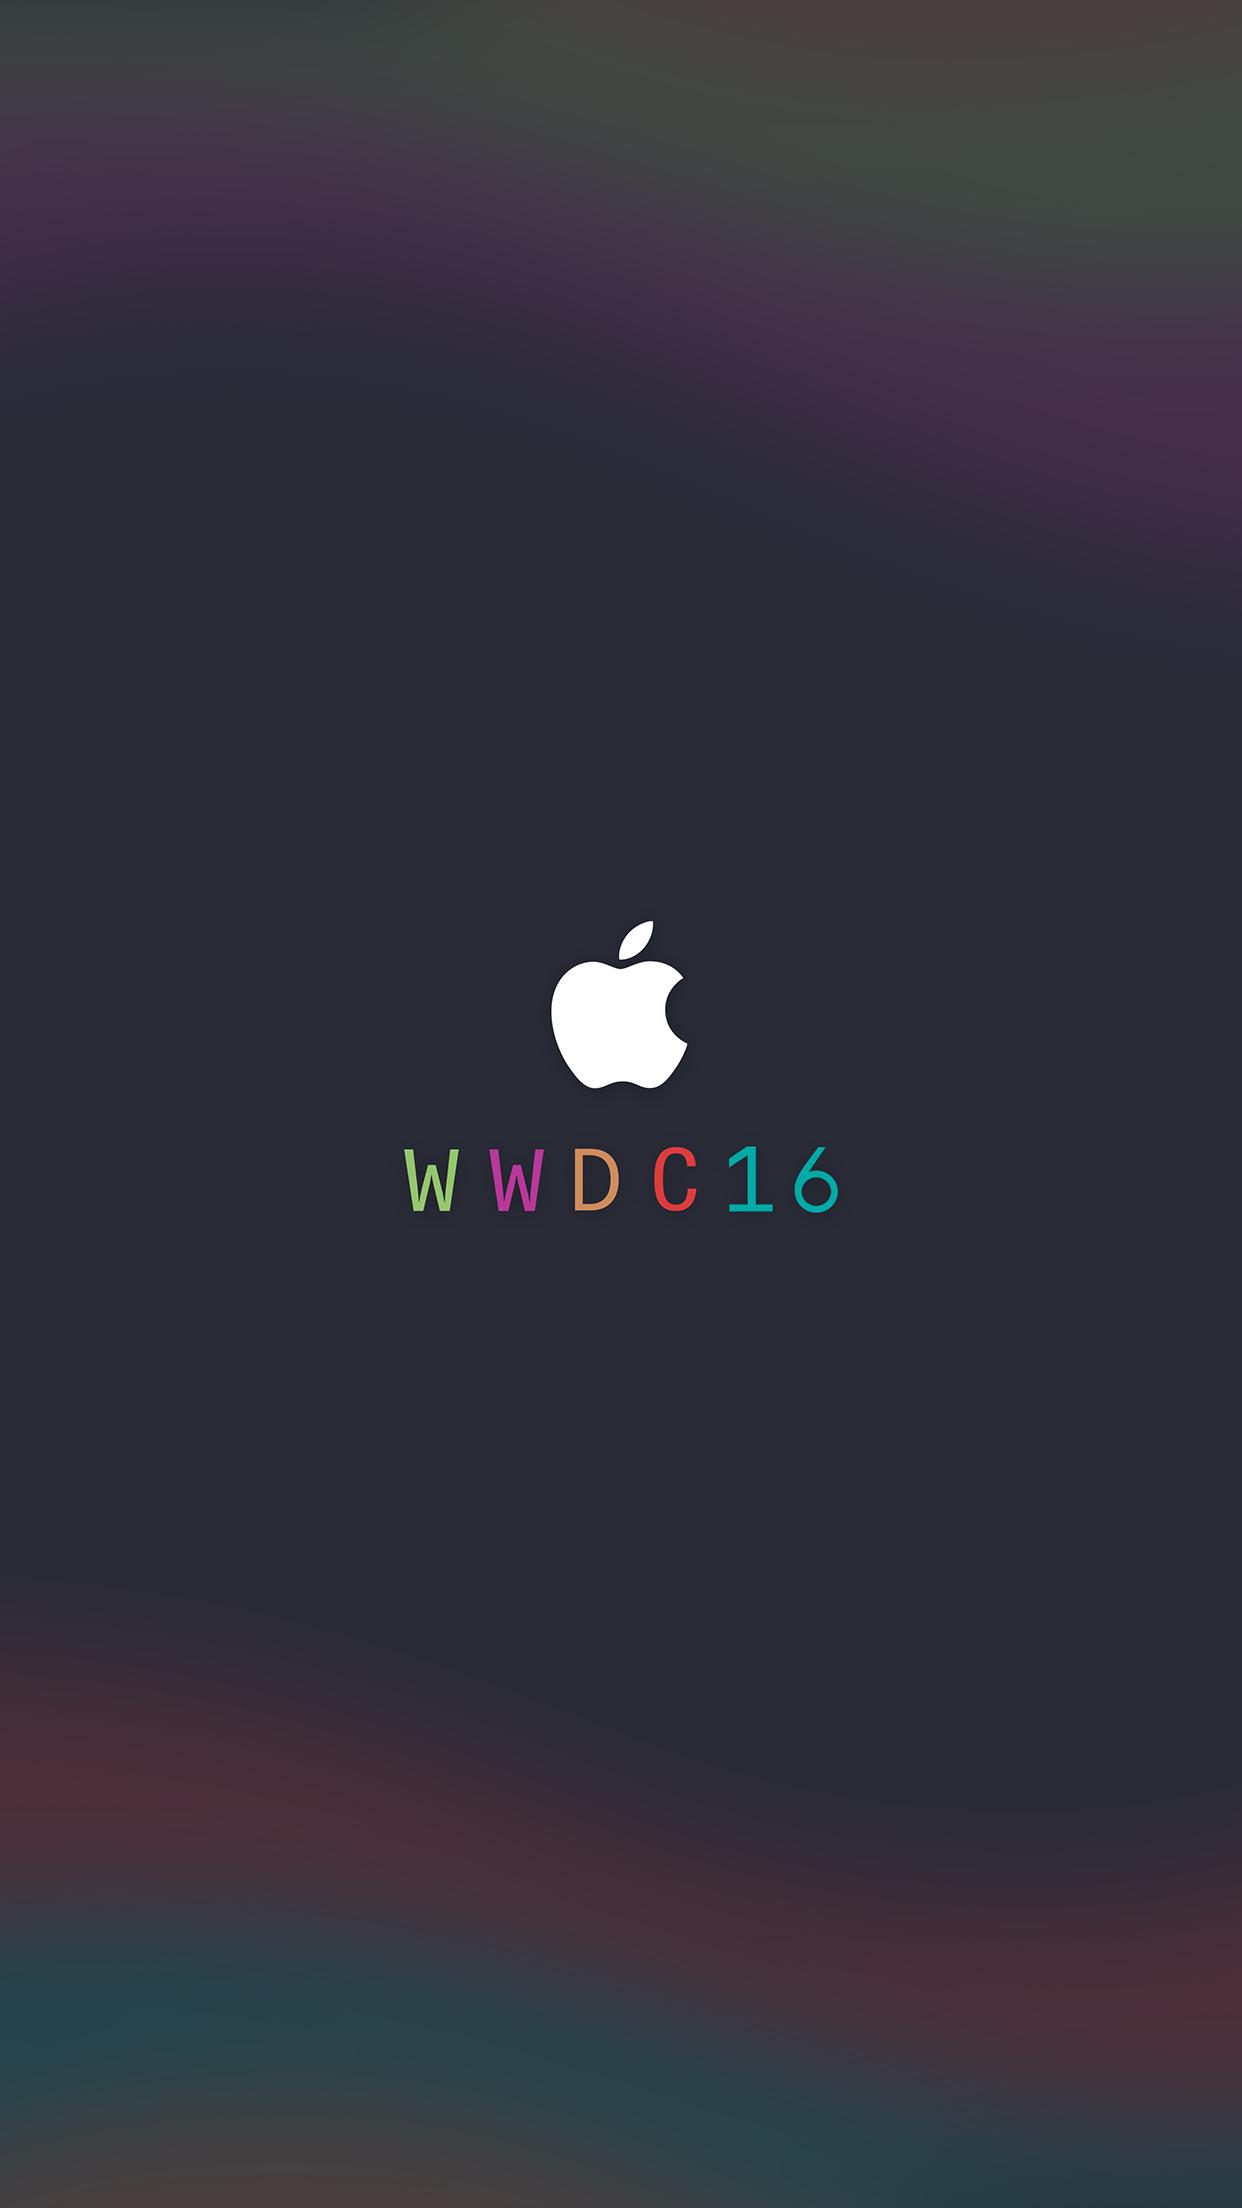 Keynote 2016 Keynote Logo 3 3Wallpapers iPhone Parallax Apple Keynote logo 3